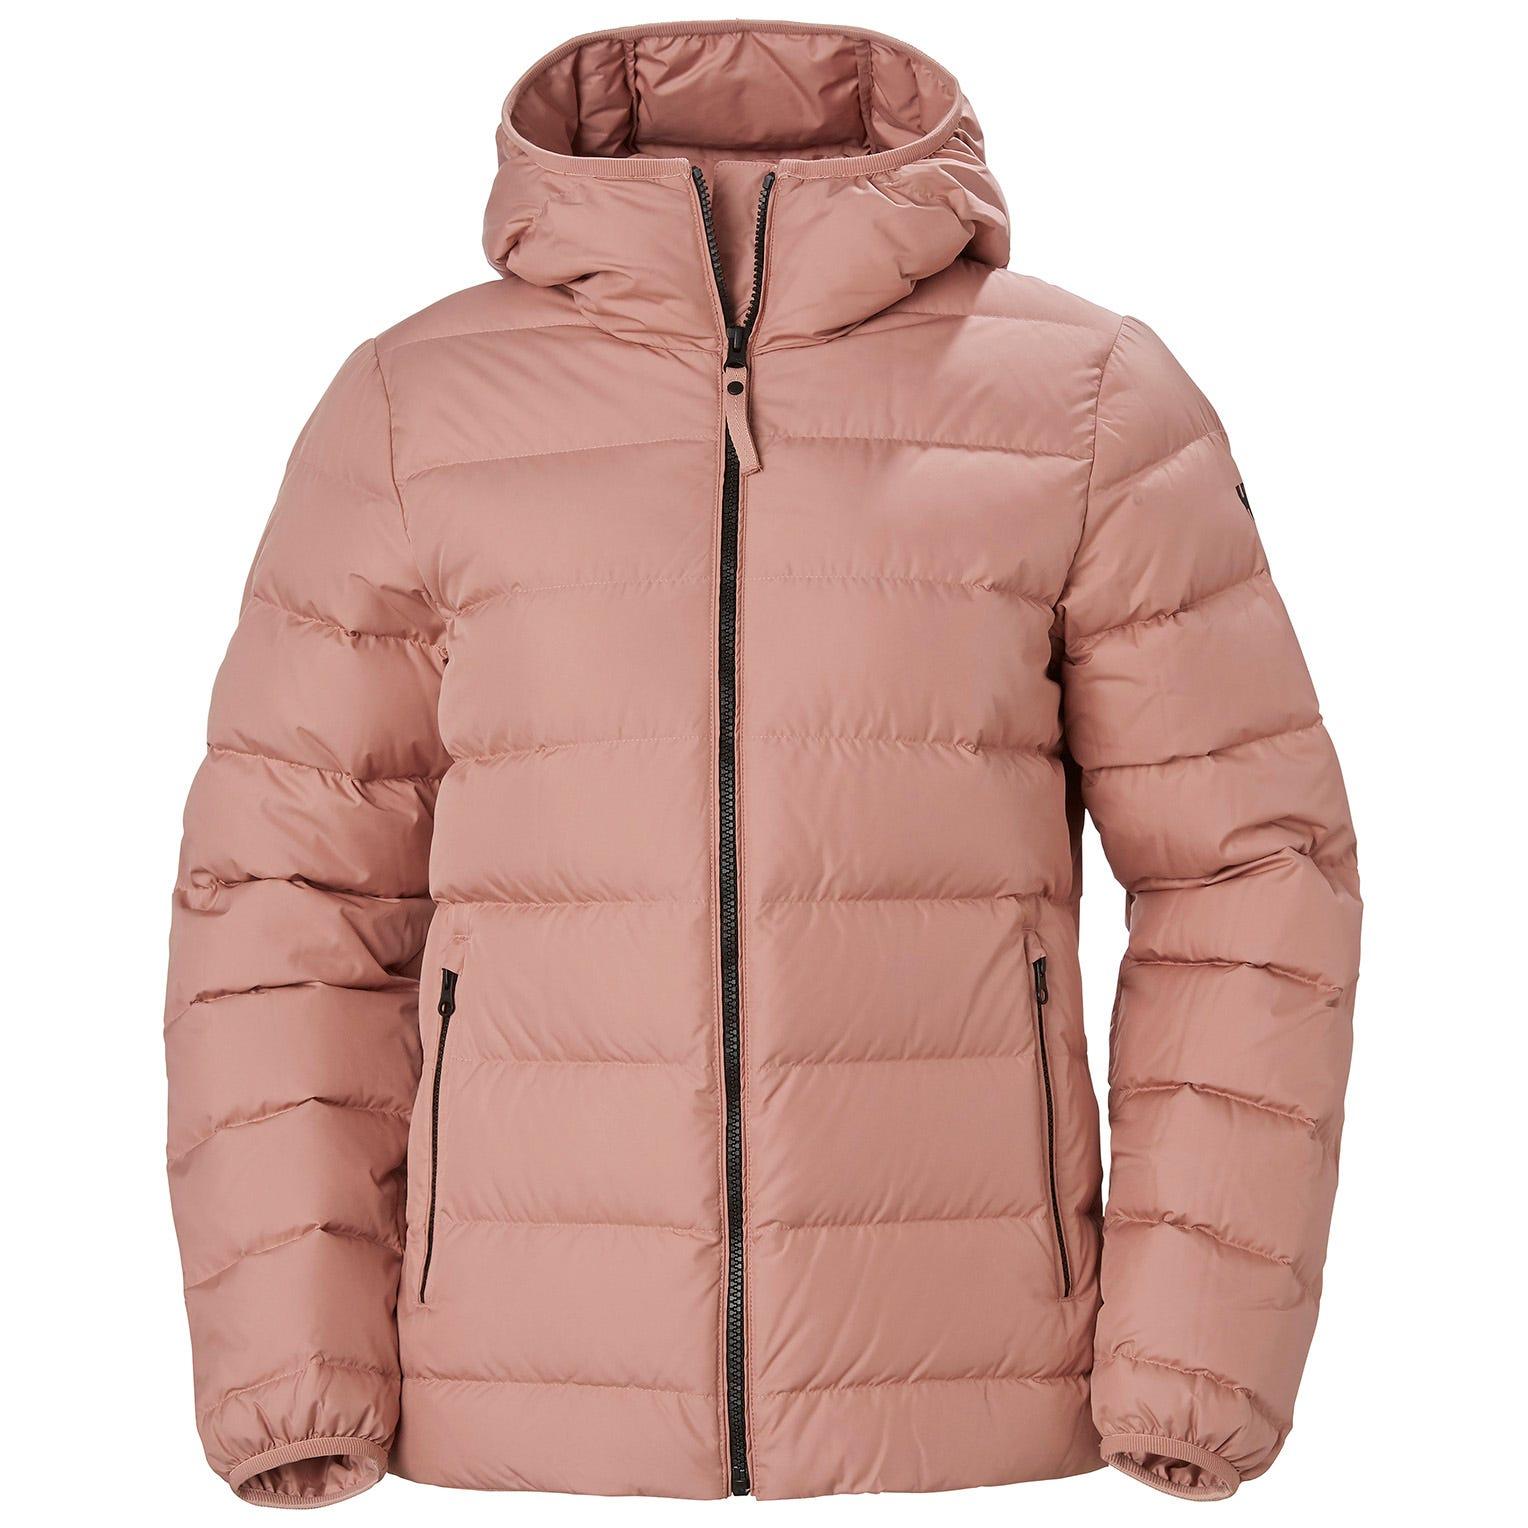 Helly Hansen Womens Pink XL